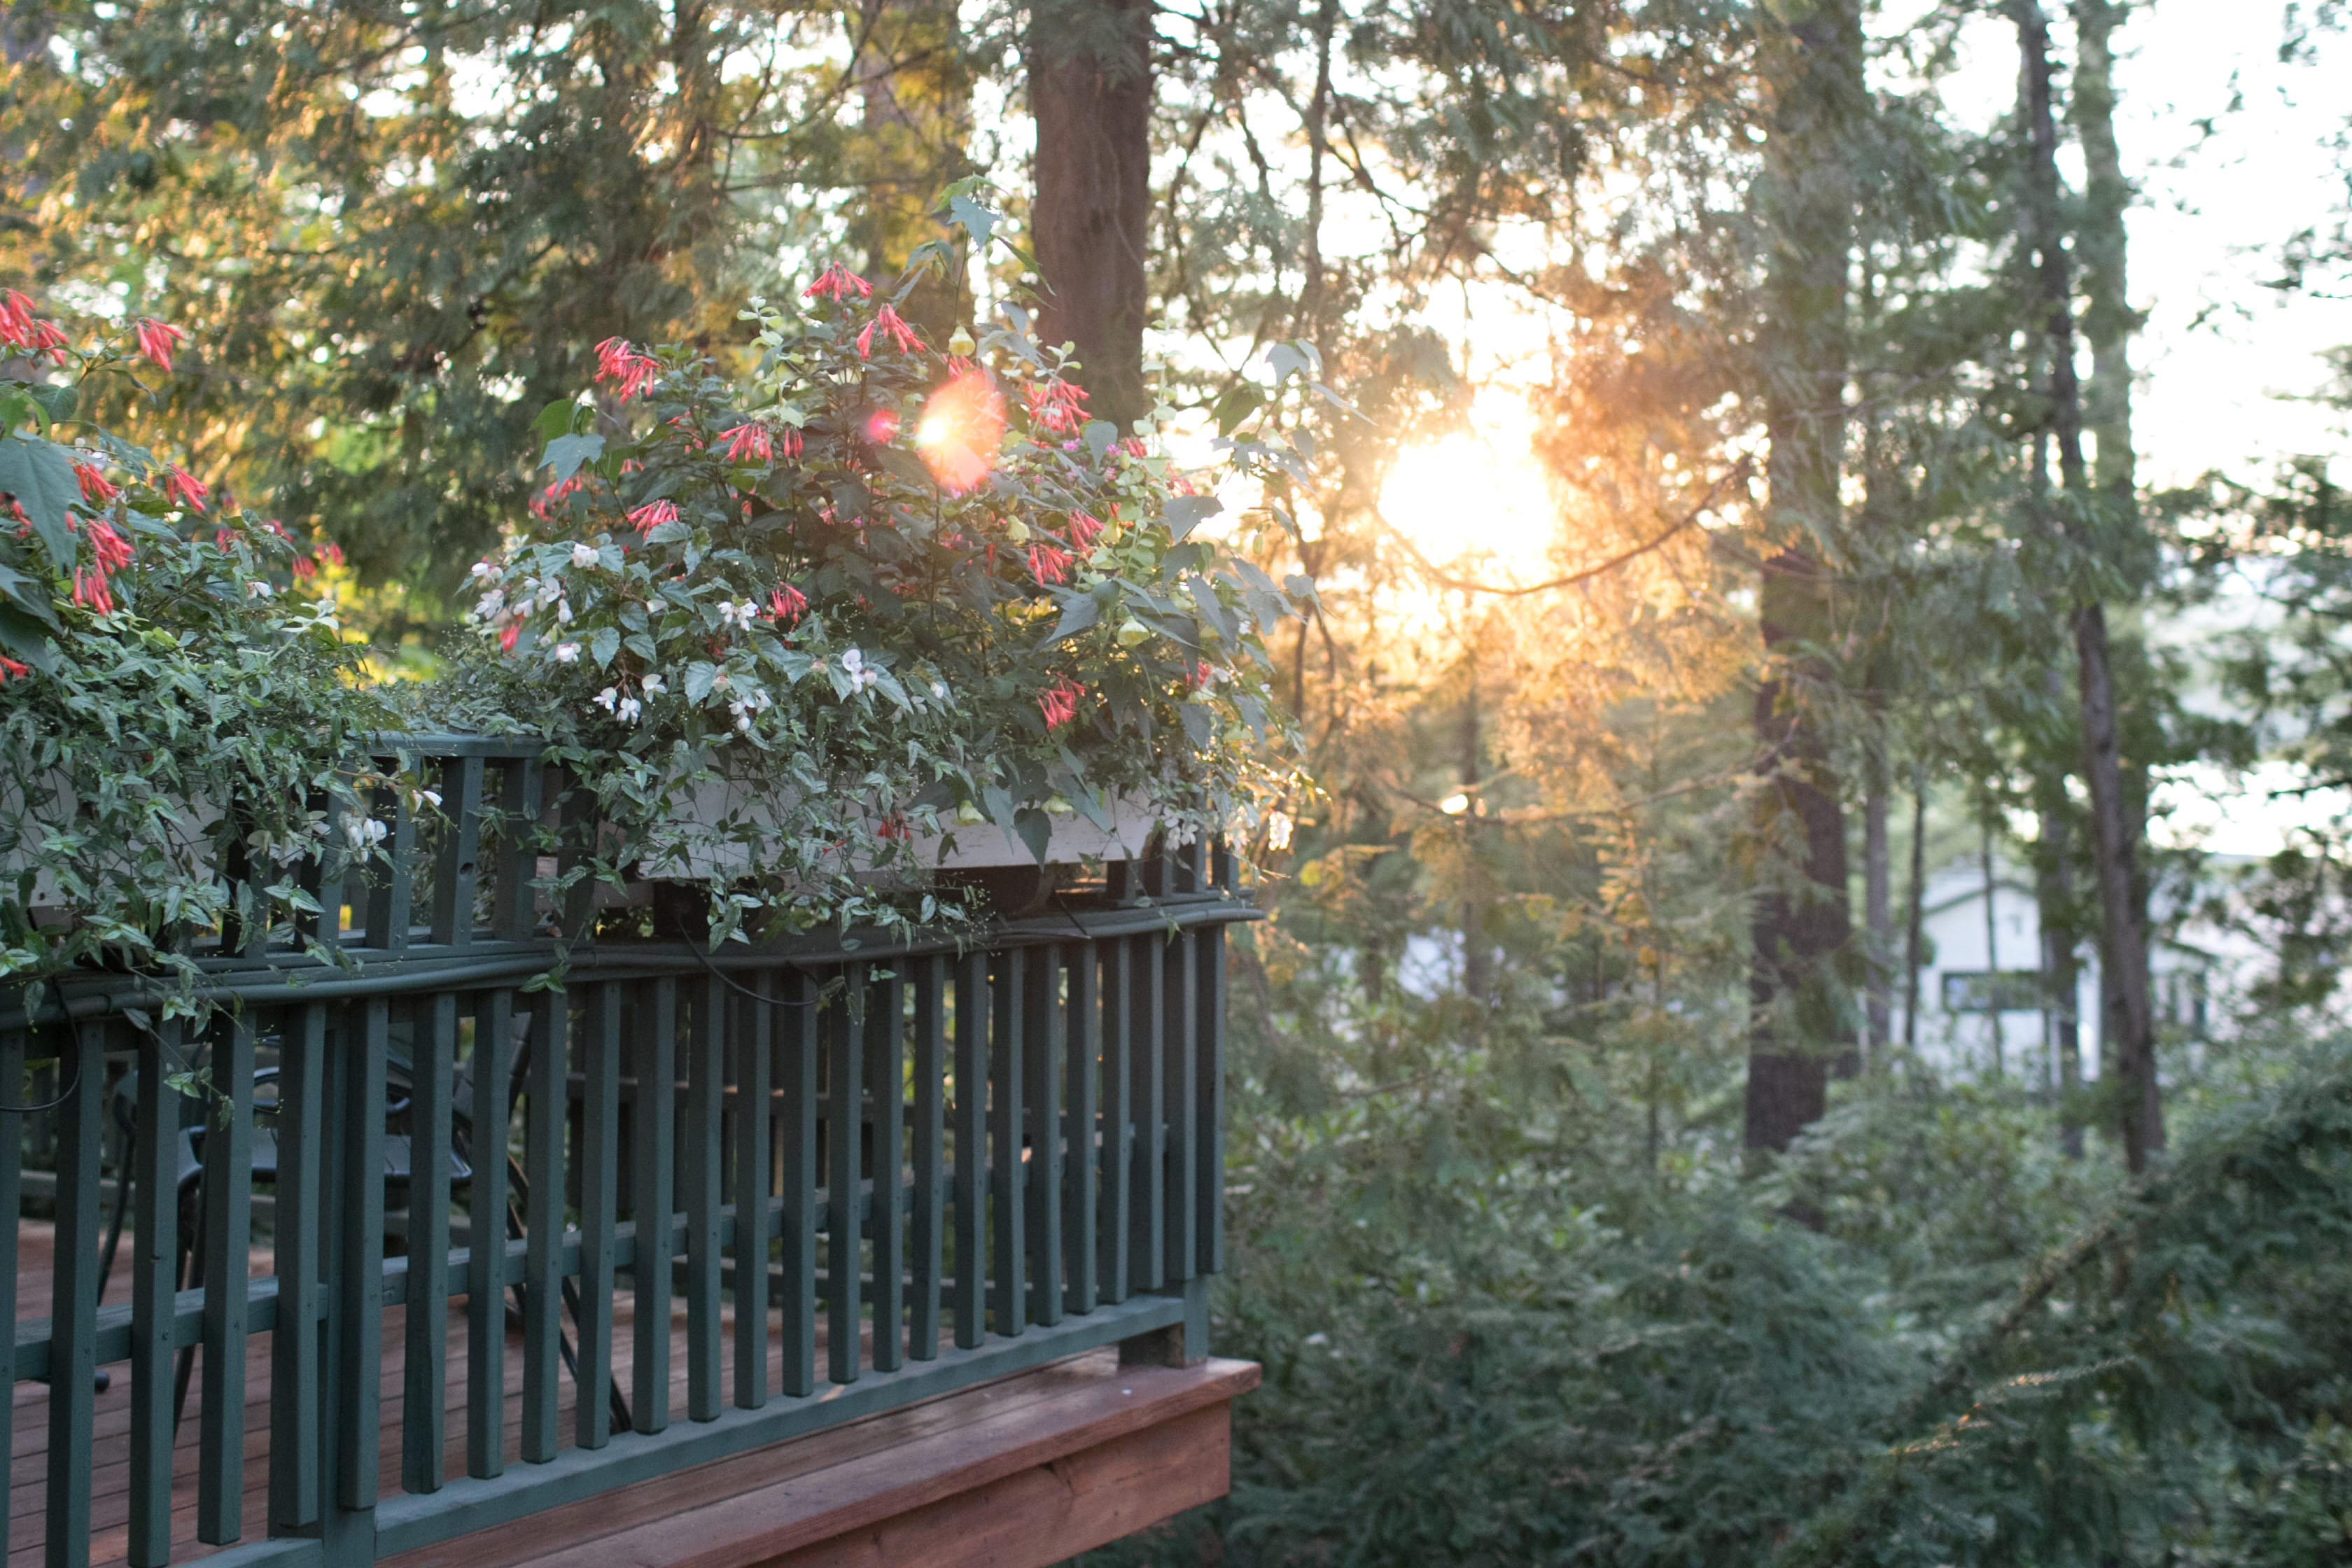 Flowers on porch railing